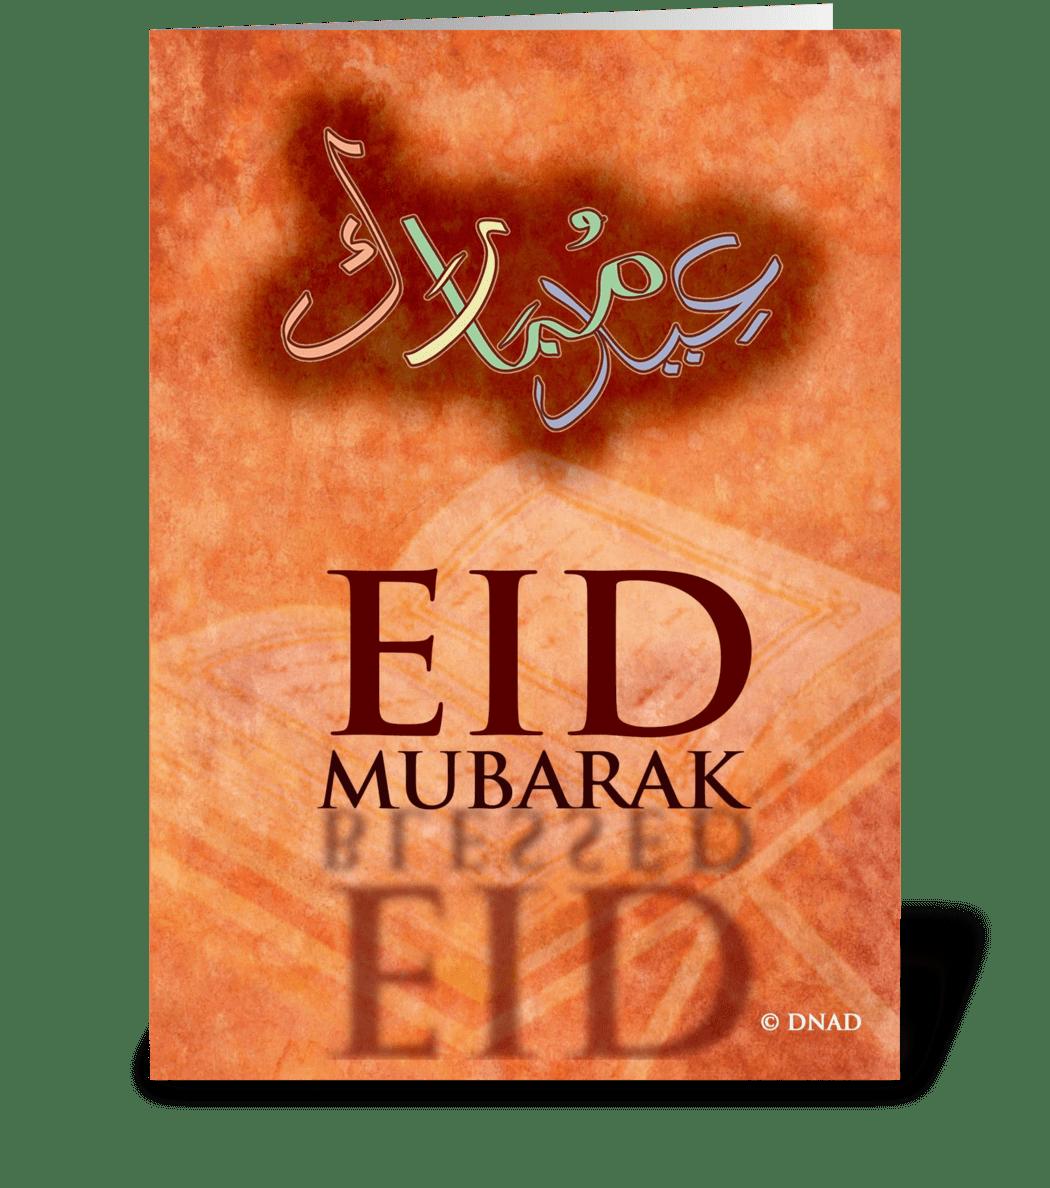 eid reflections  send this greeting card designednew